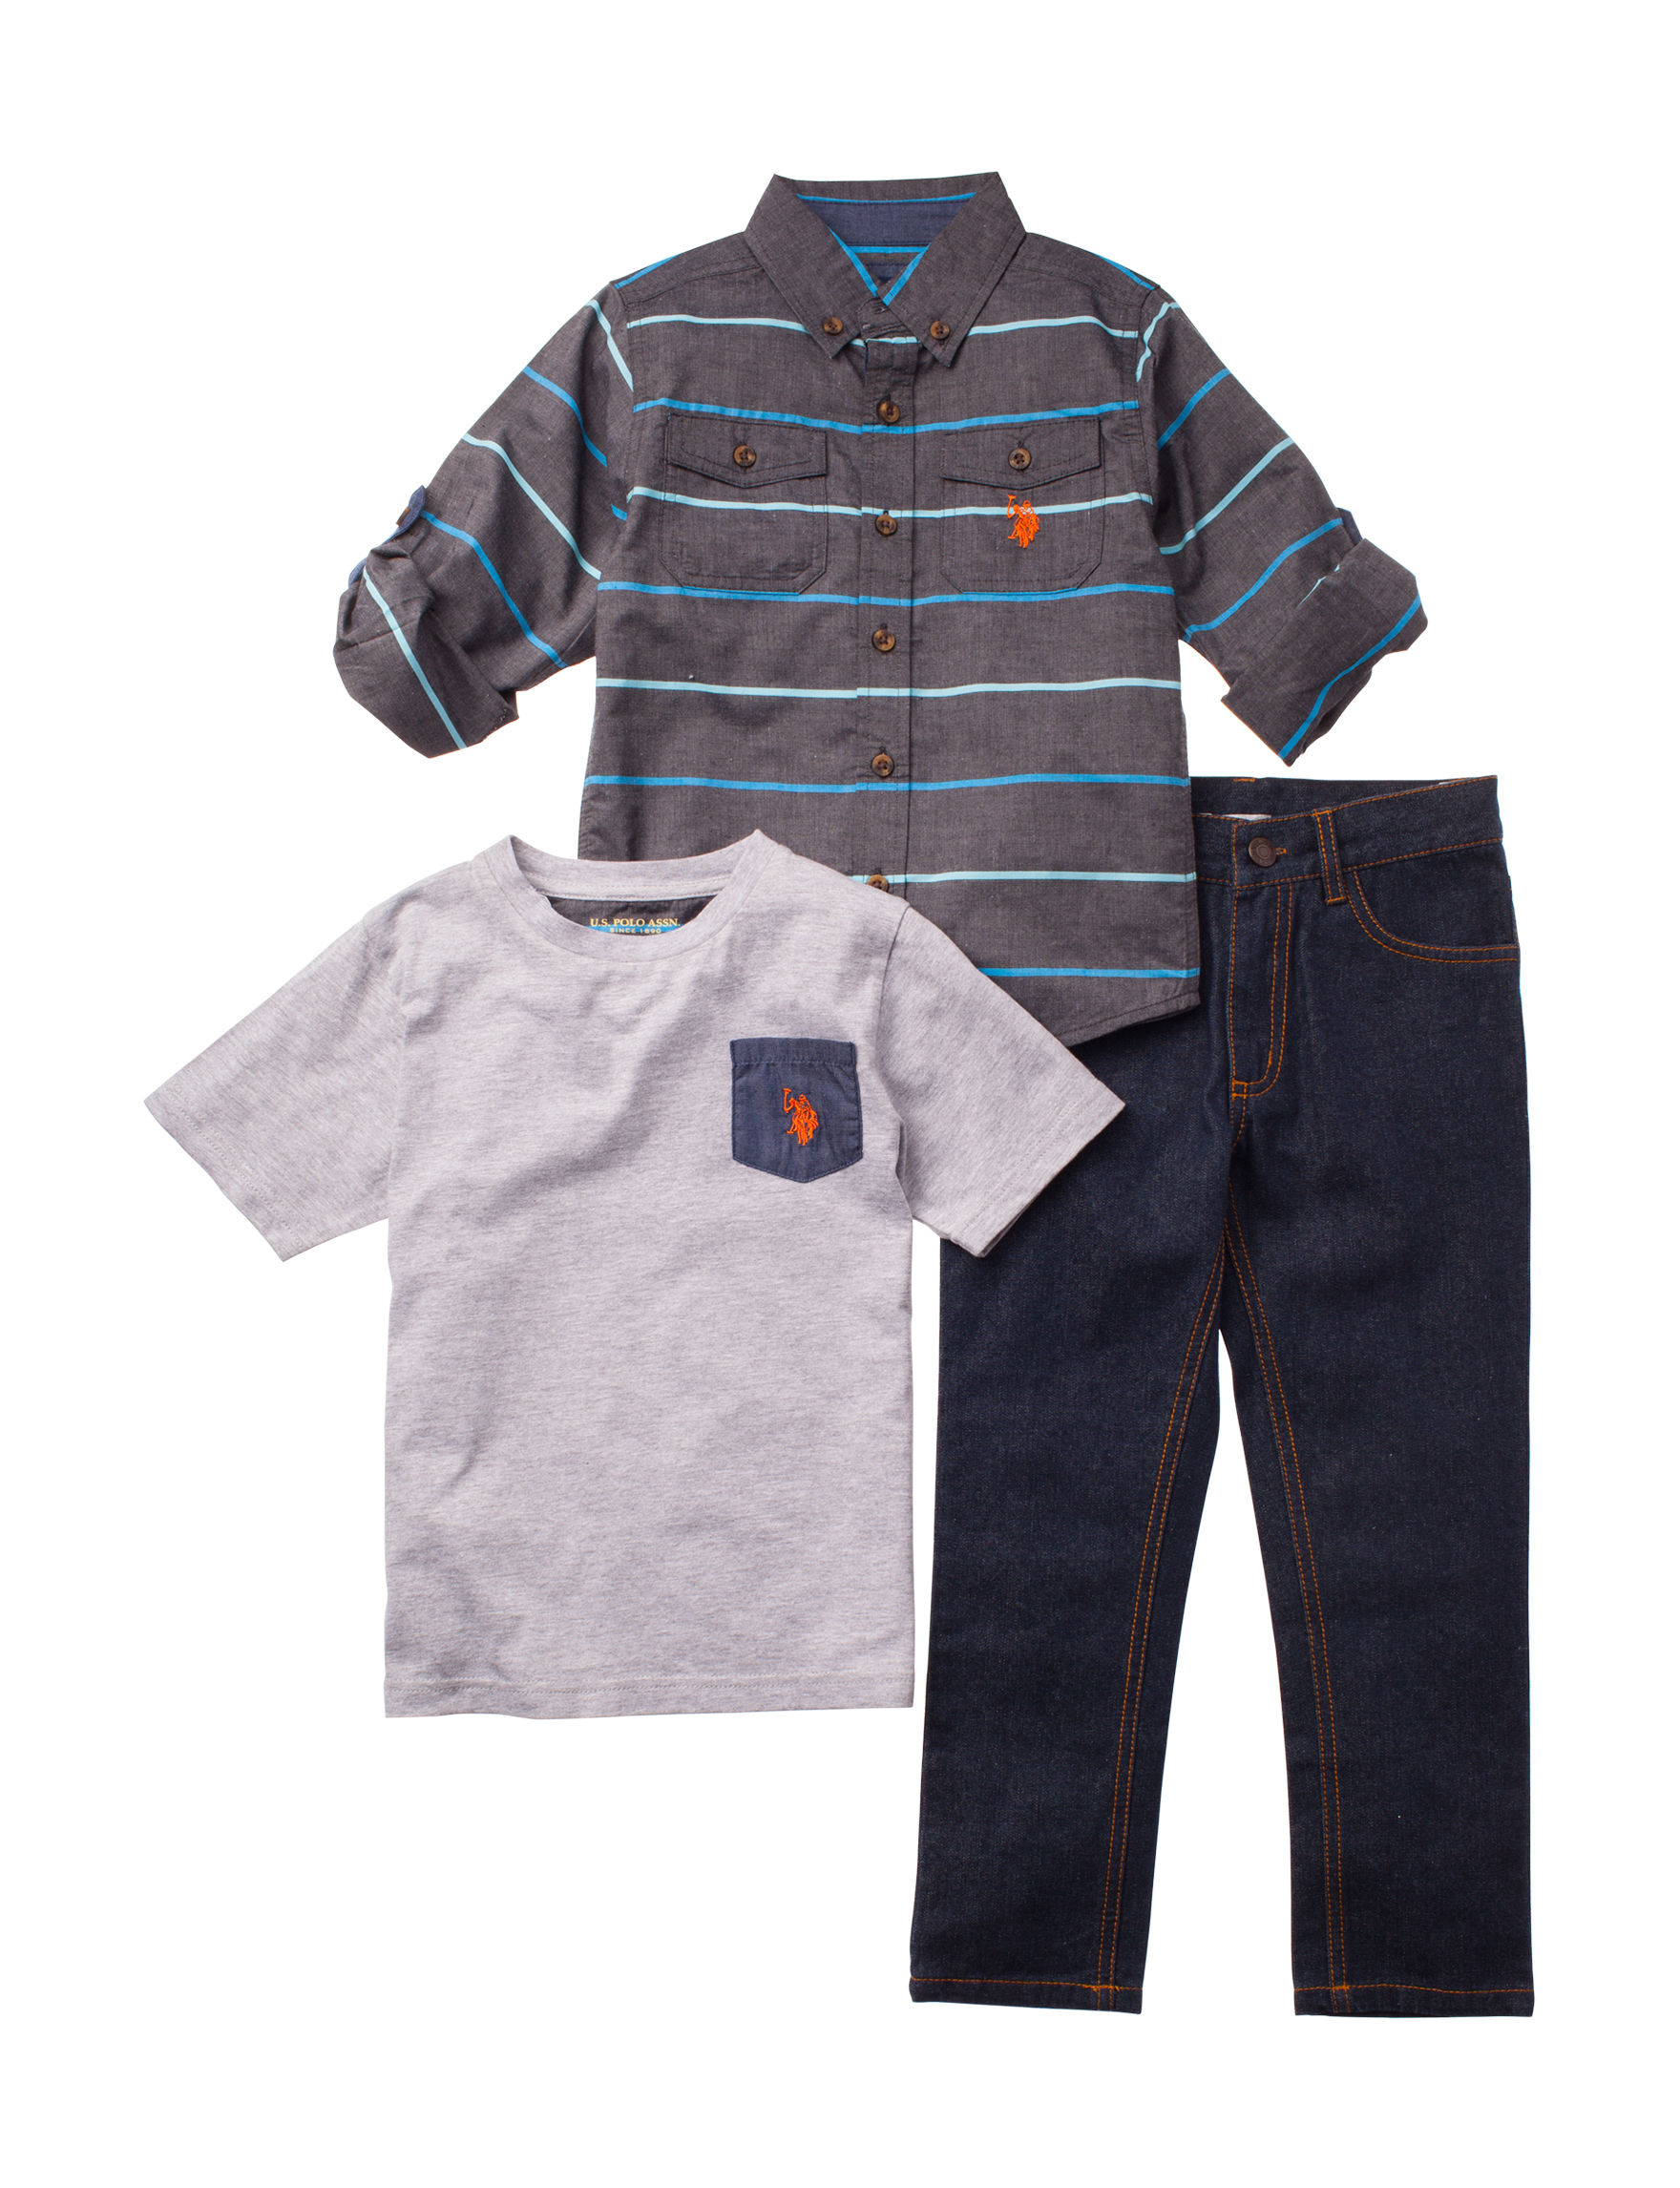 U.S. Polo Assn. Blue Stripe Tees & Tanks